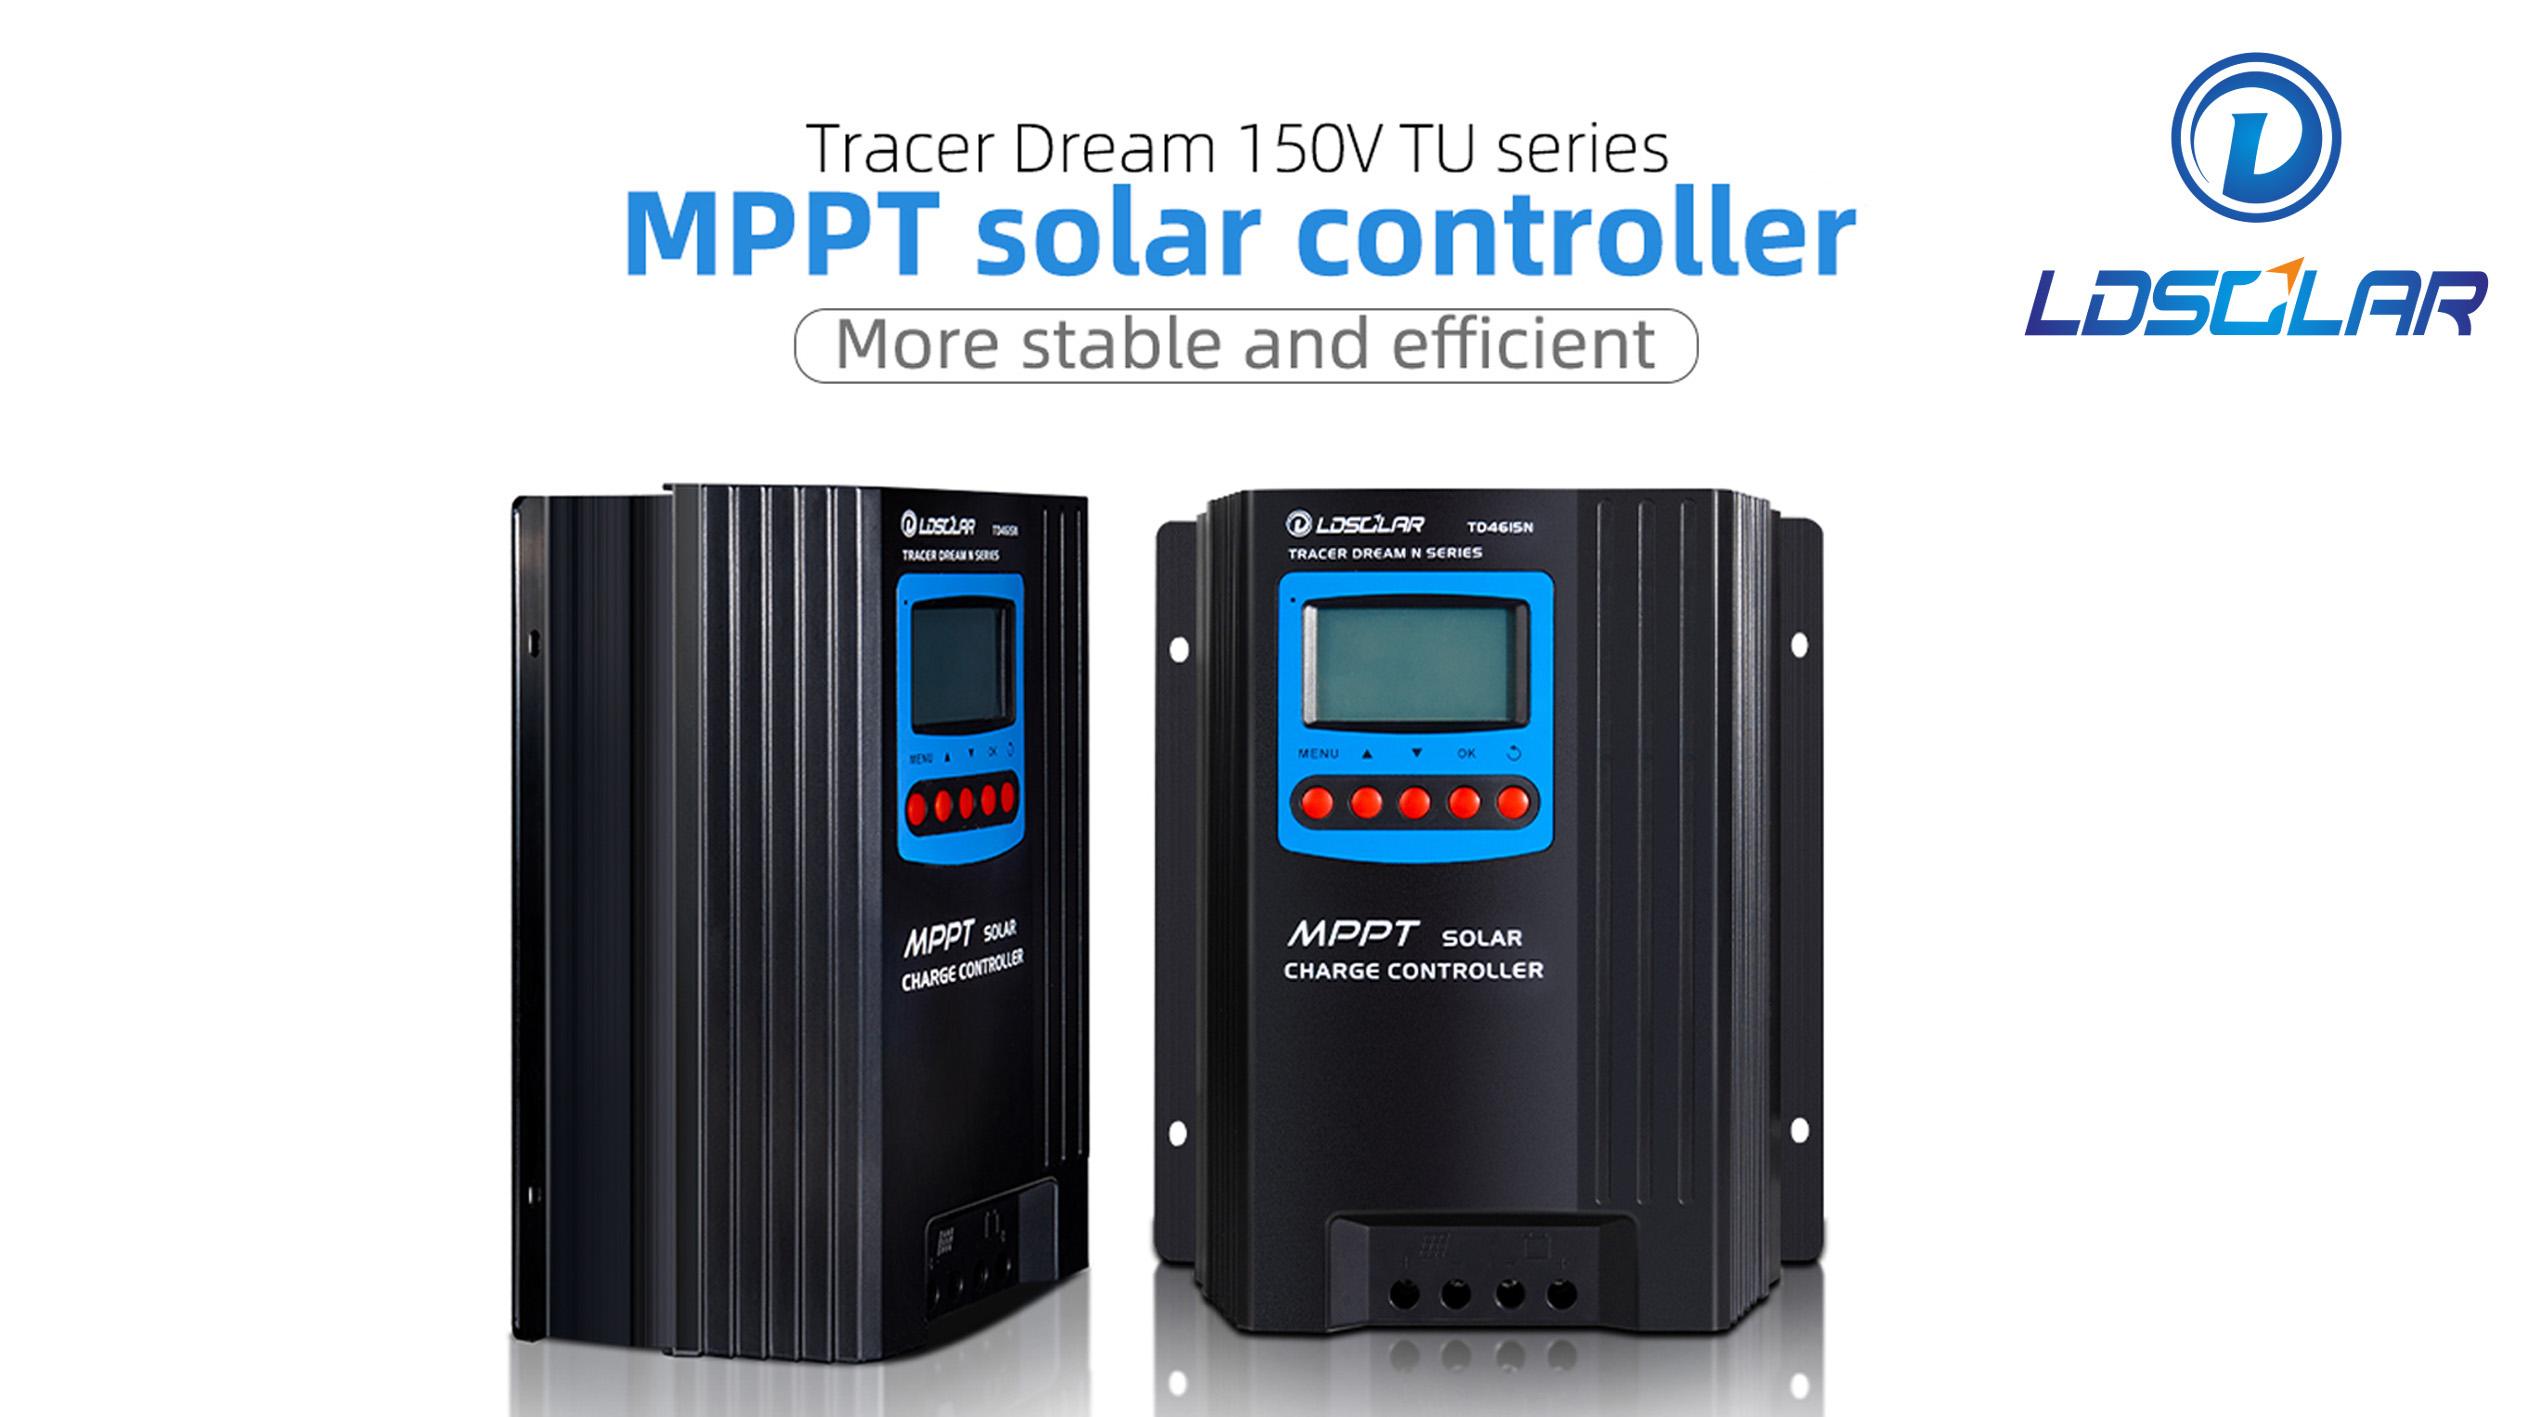 Regolatore solare MPPT Tracer Dream 150V serie TU